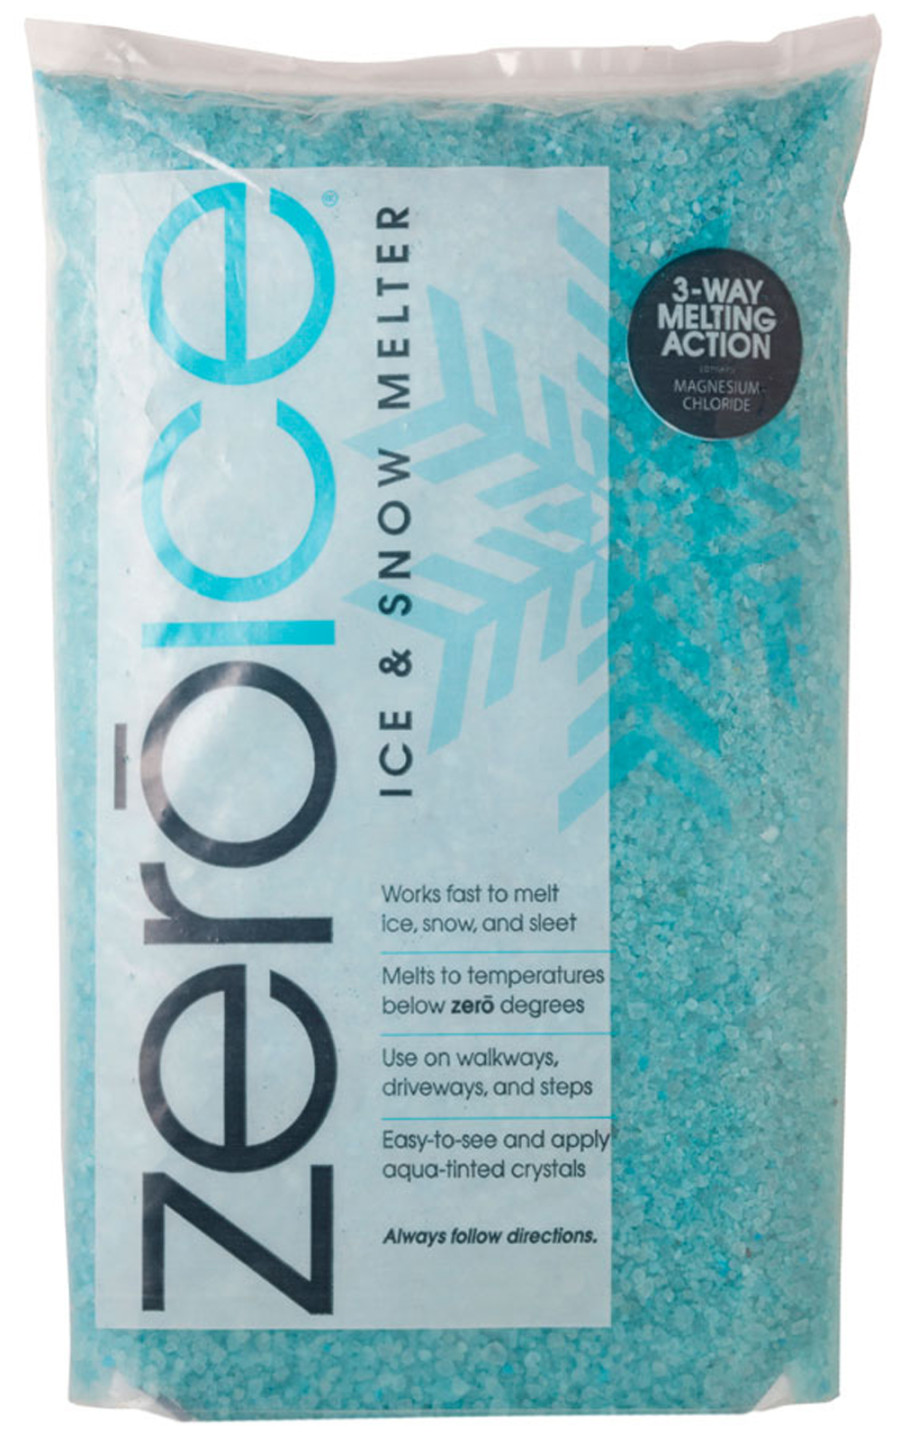 Howard Johnson Zero Ice & Snow Melter Bag 4ea/10 lb